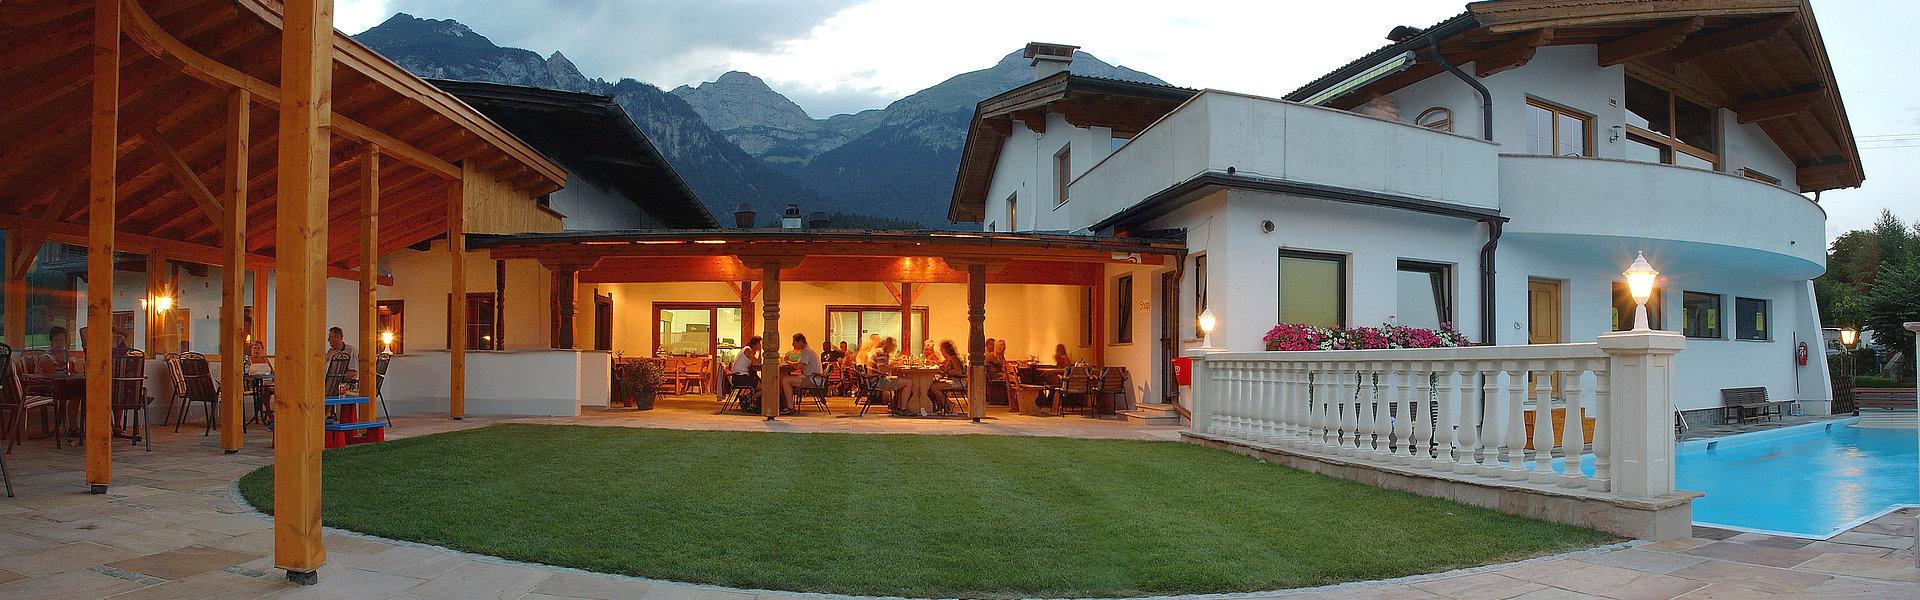 "Panorama Terrasse ""Inntal Stadl"" - Camping Inntal"